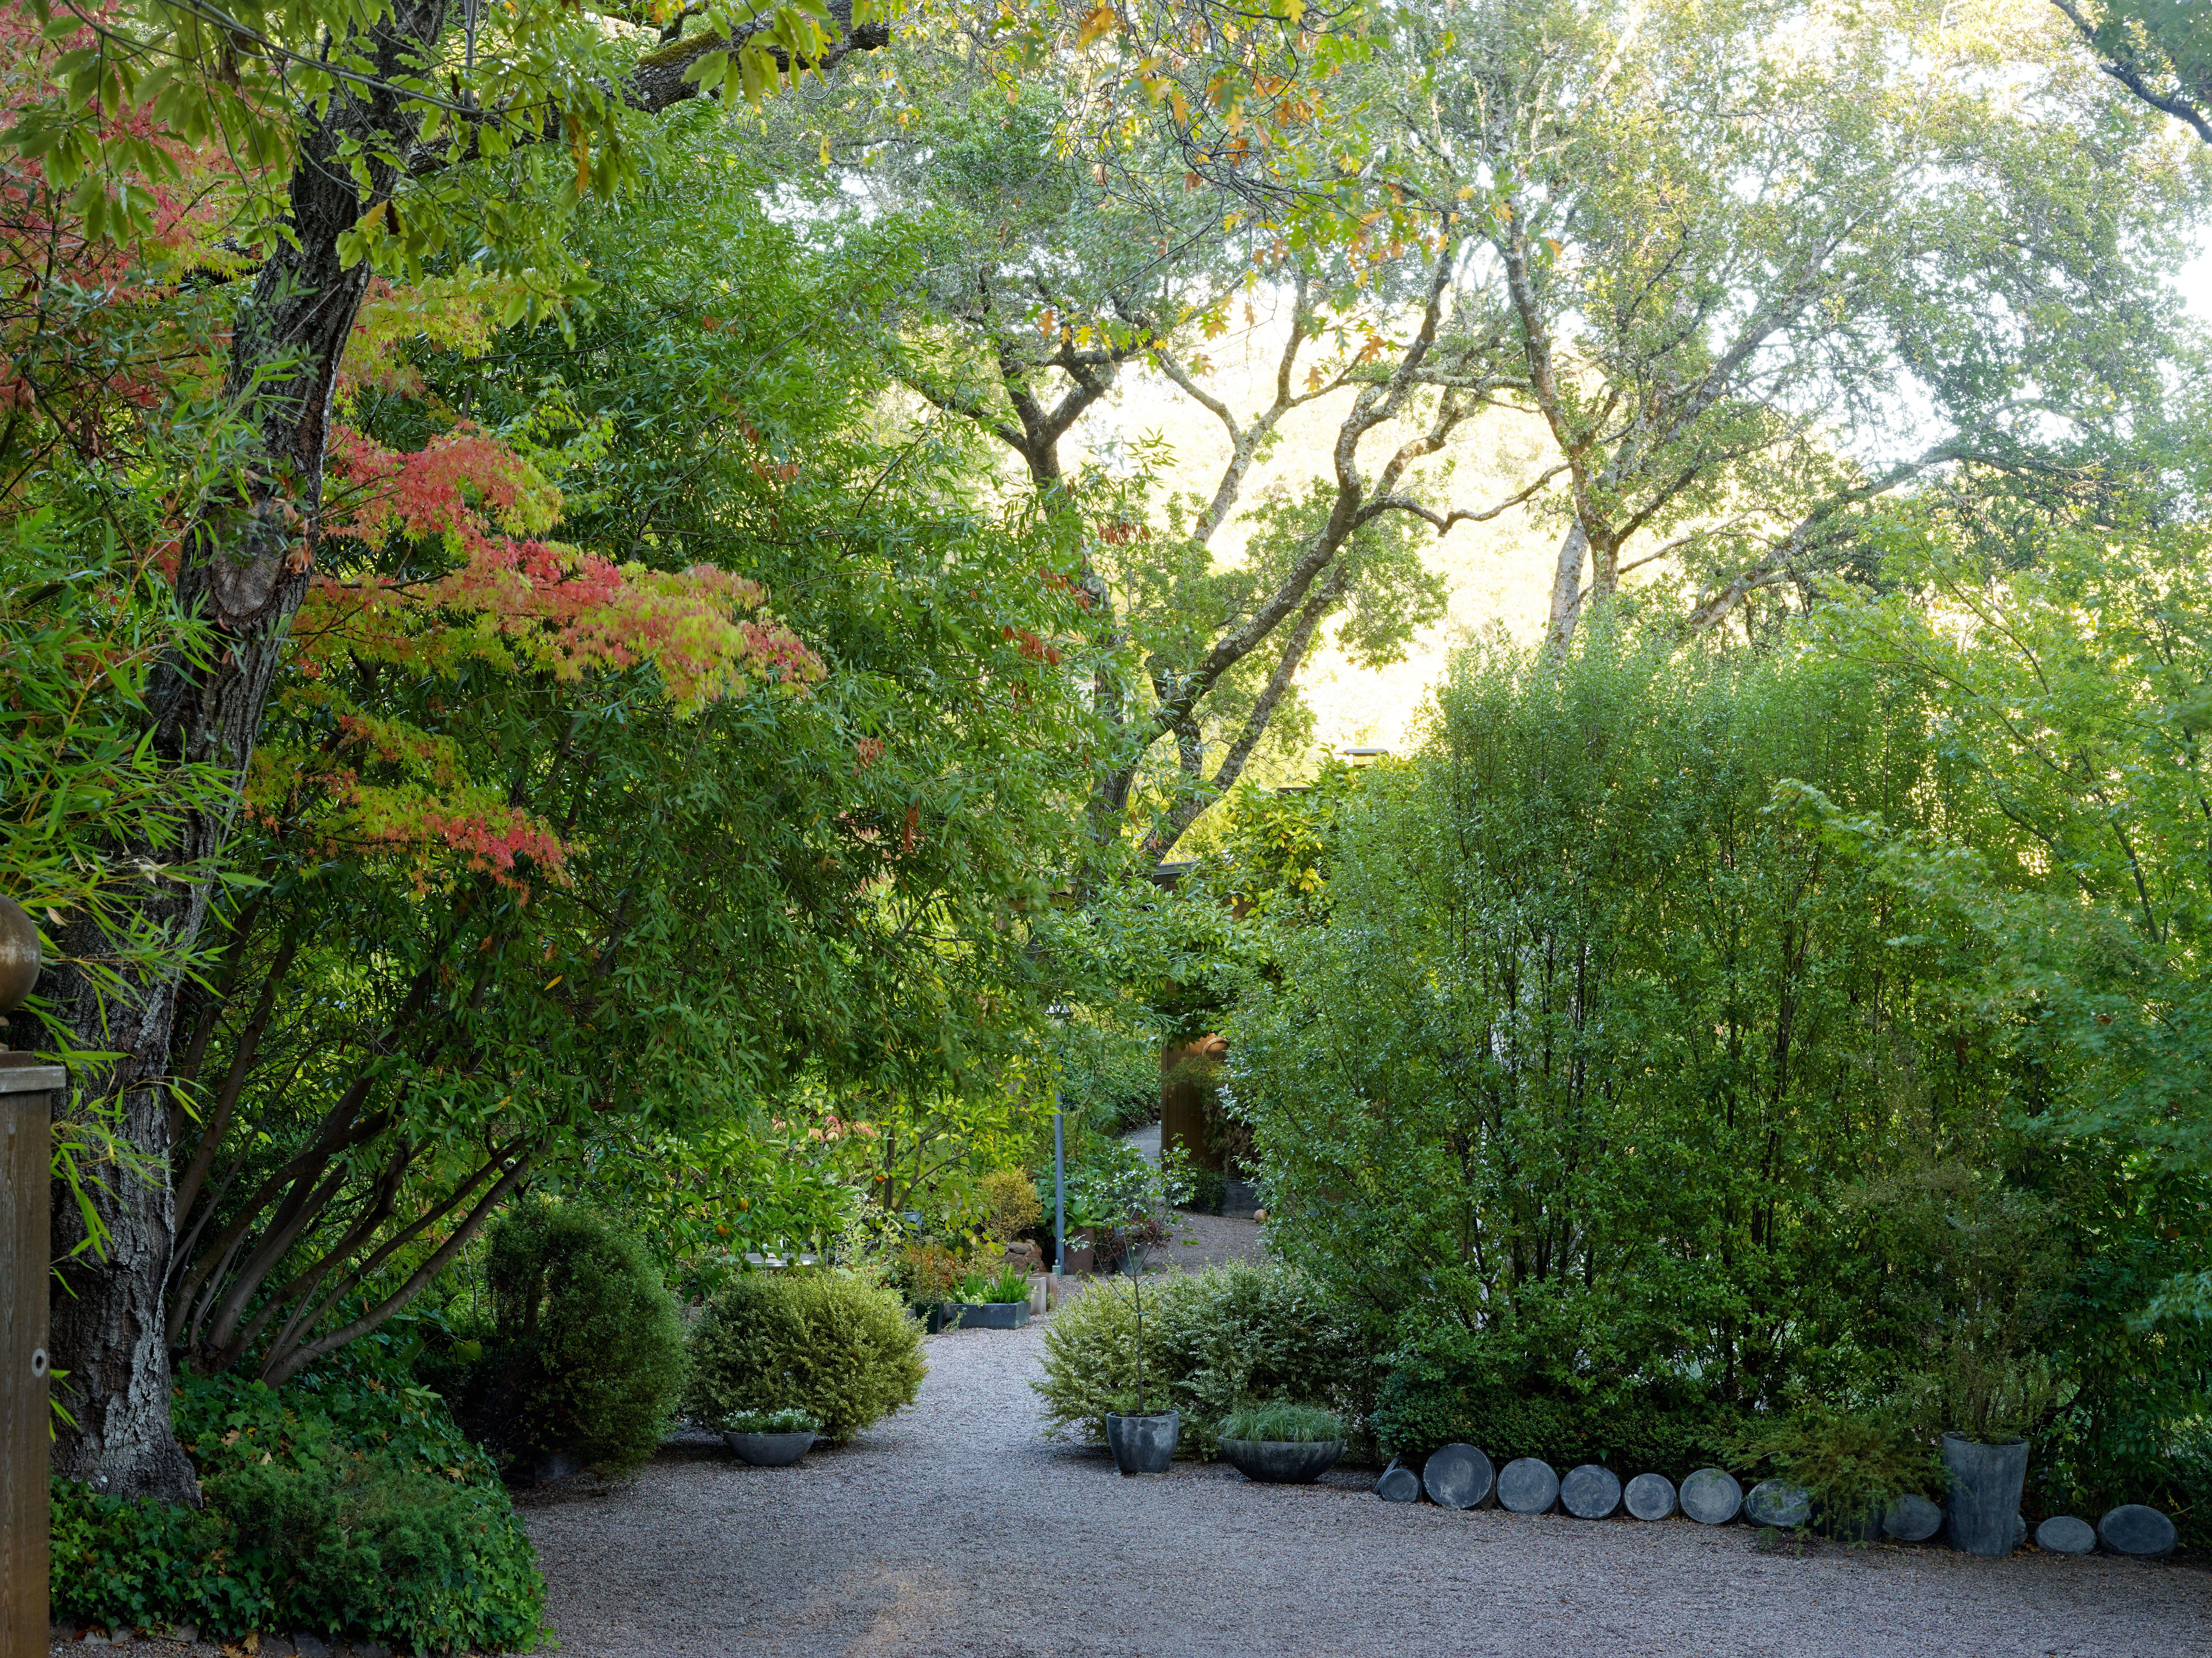 Blasen Landscape Architecture Unearths The Gardens Of Tomorrow Photos -